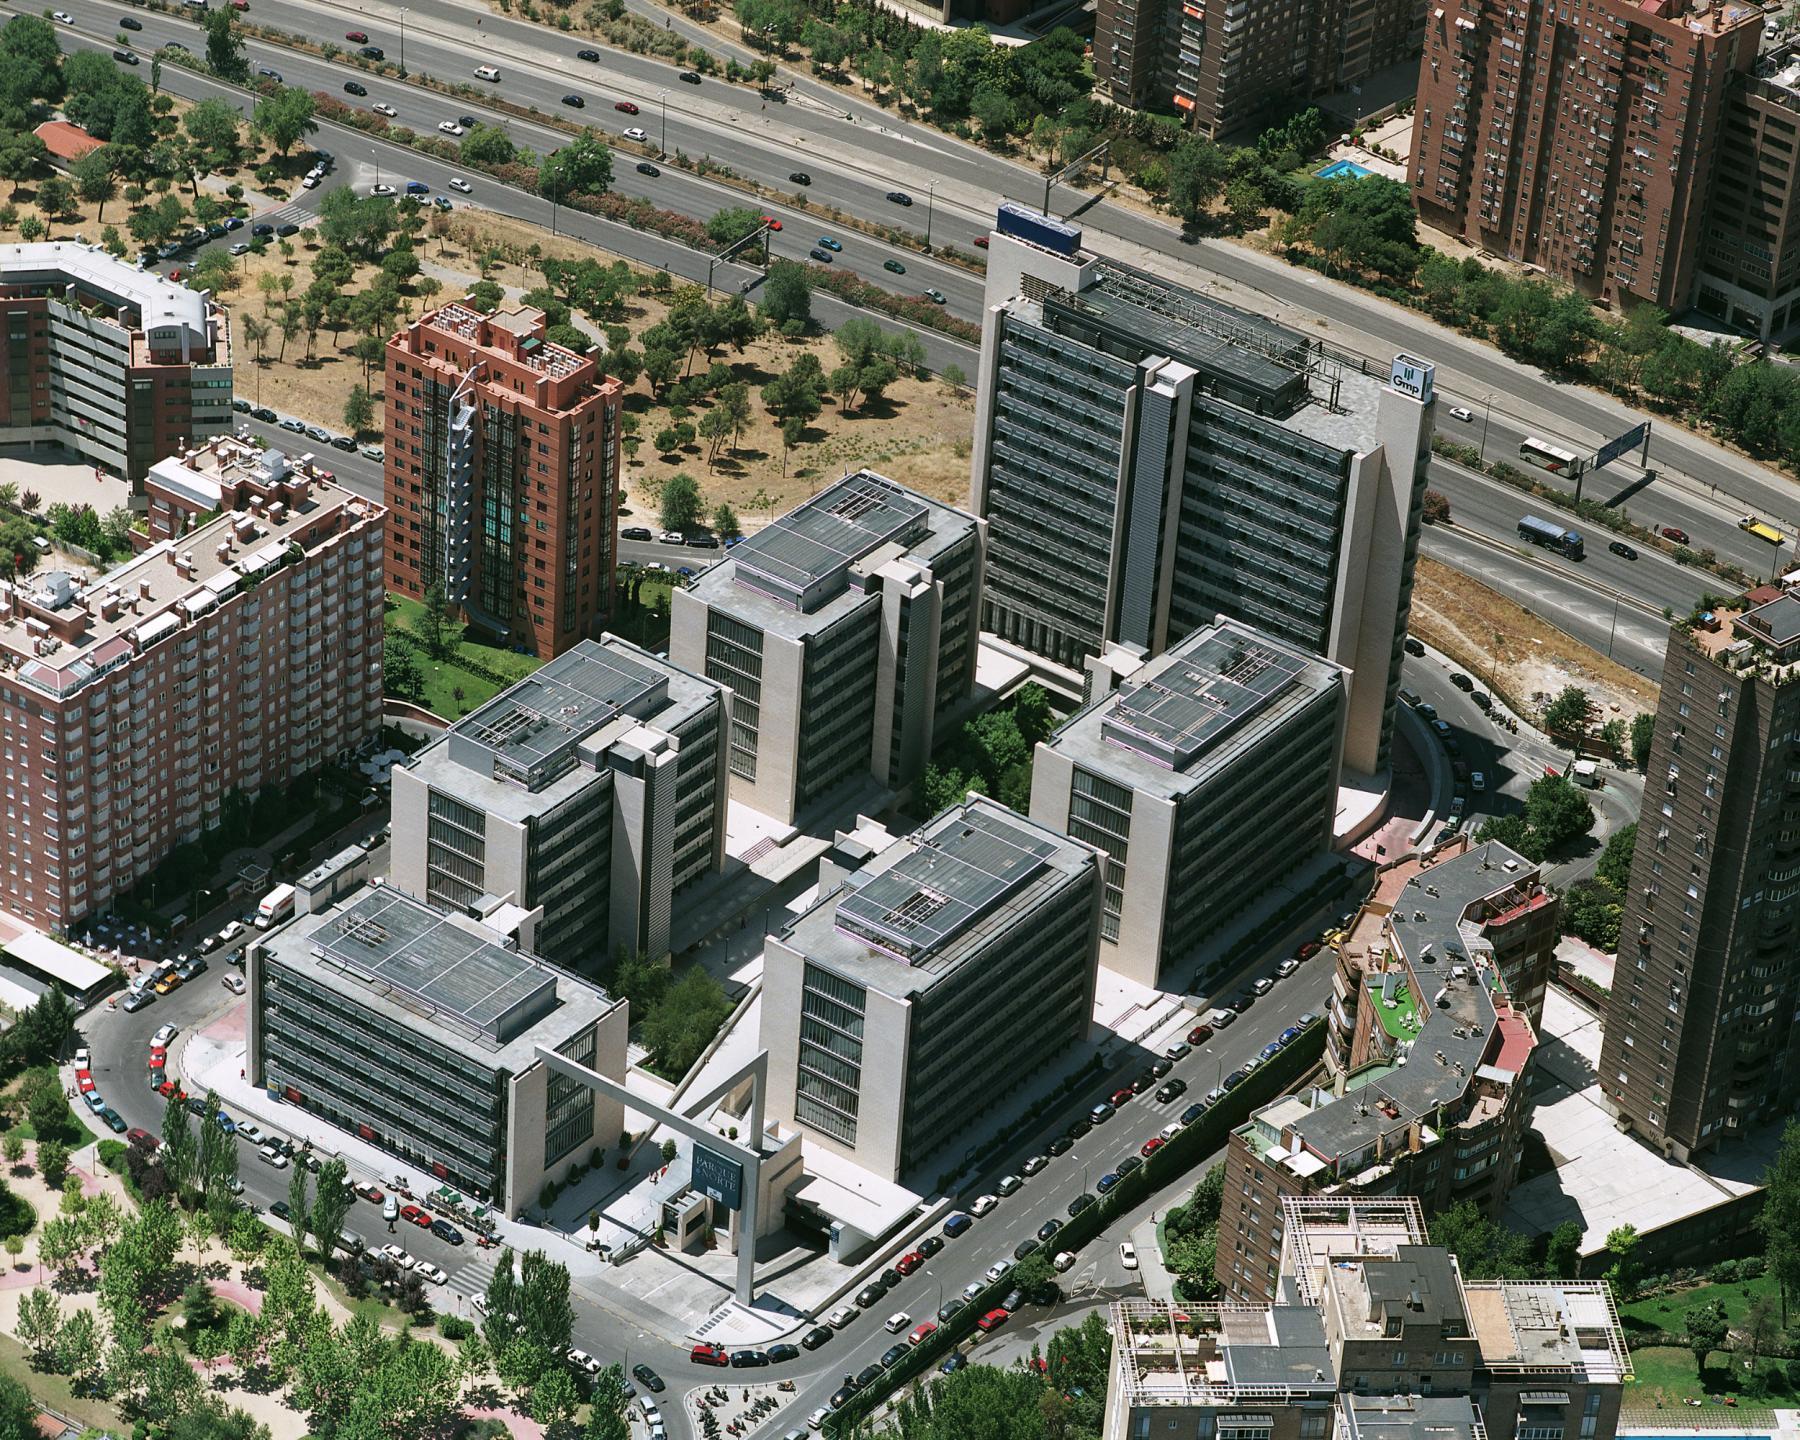 Alquilar oficinas Calle de Serrano Galvache 33, Madrid (2)